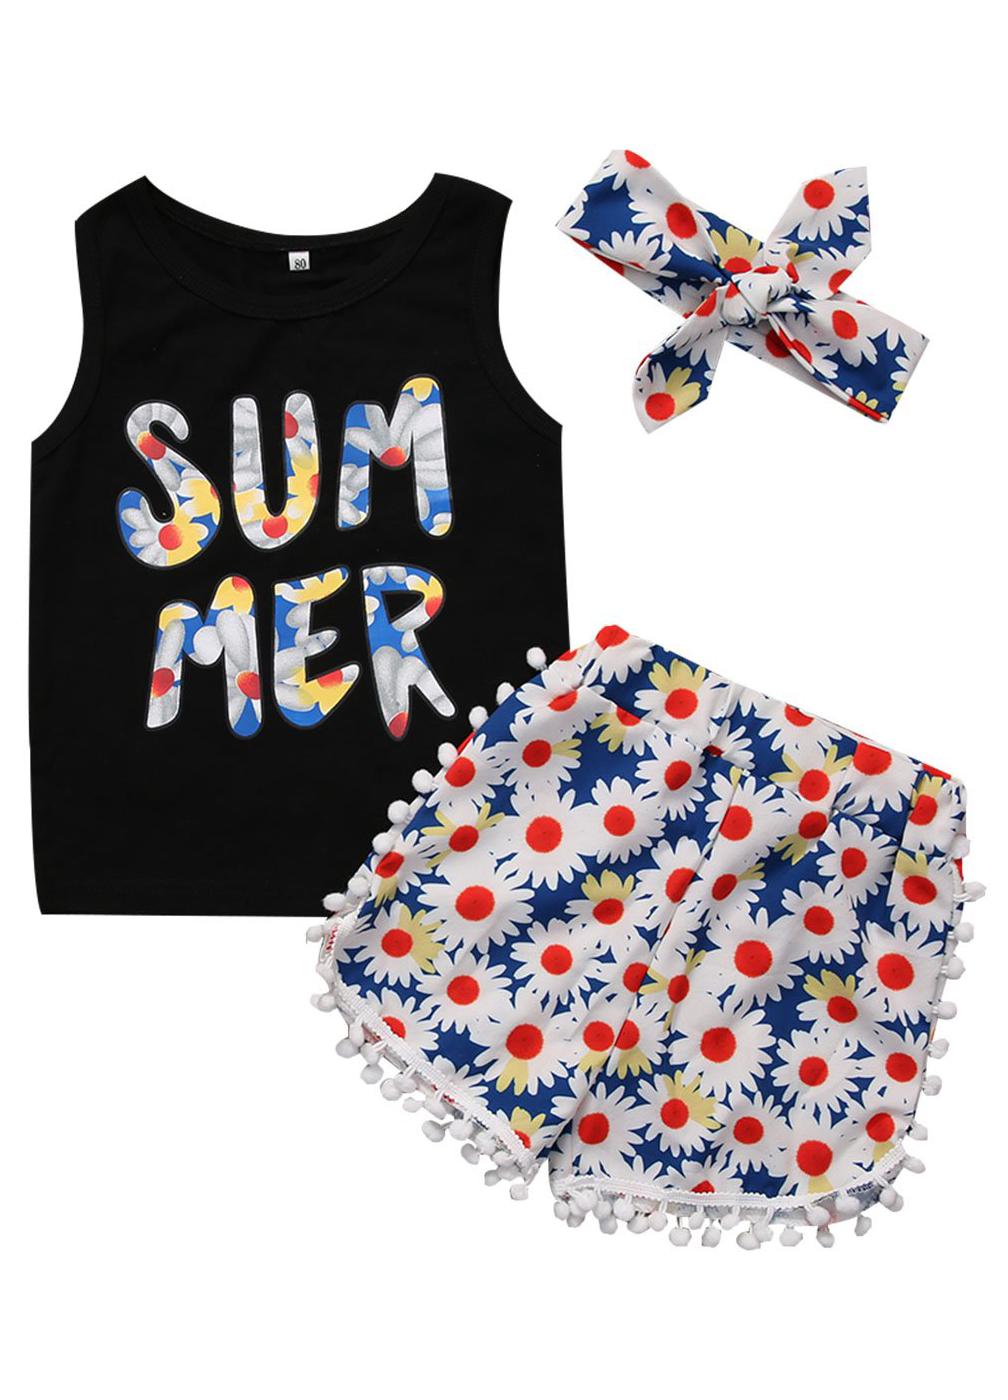 6a4d3e39b7b5b Summer Floral Set | B A B Y C L O T H E S | Kids outfits girls, Kids ...